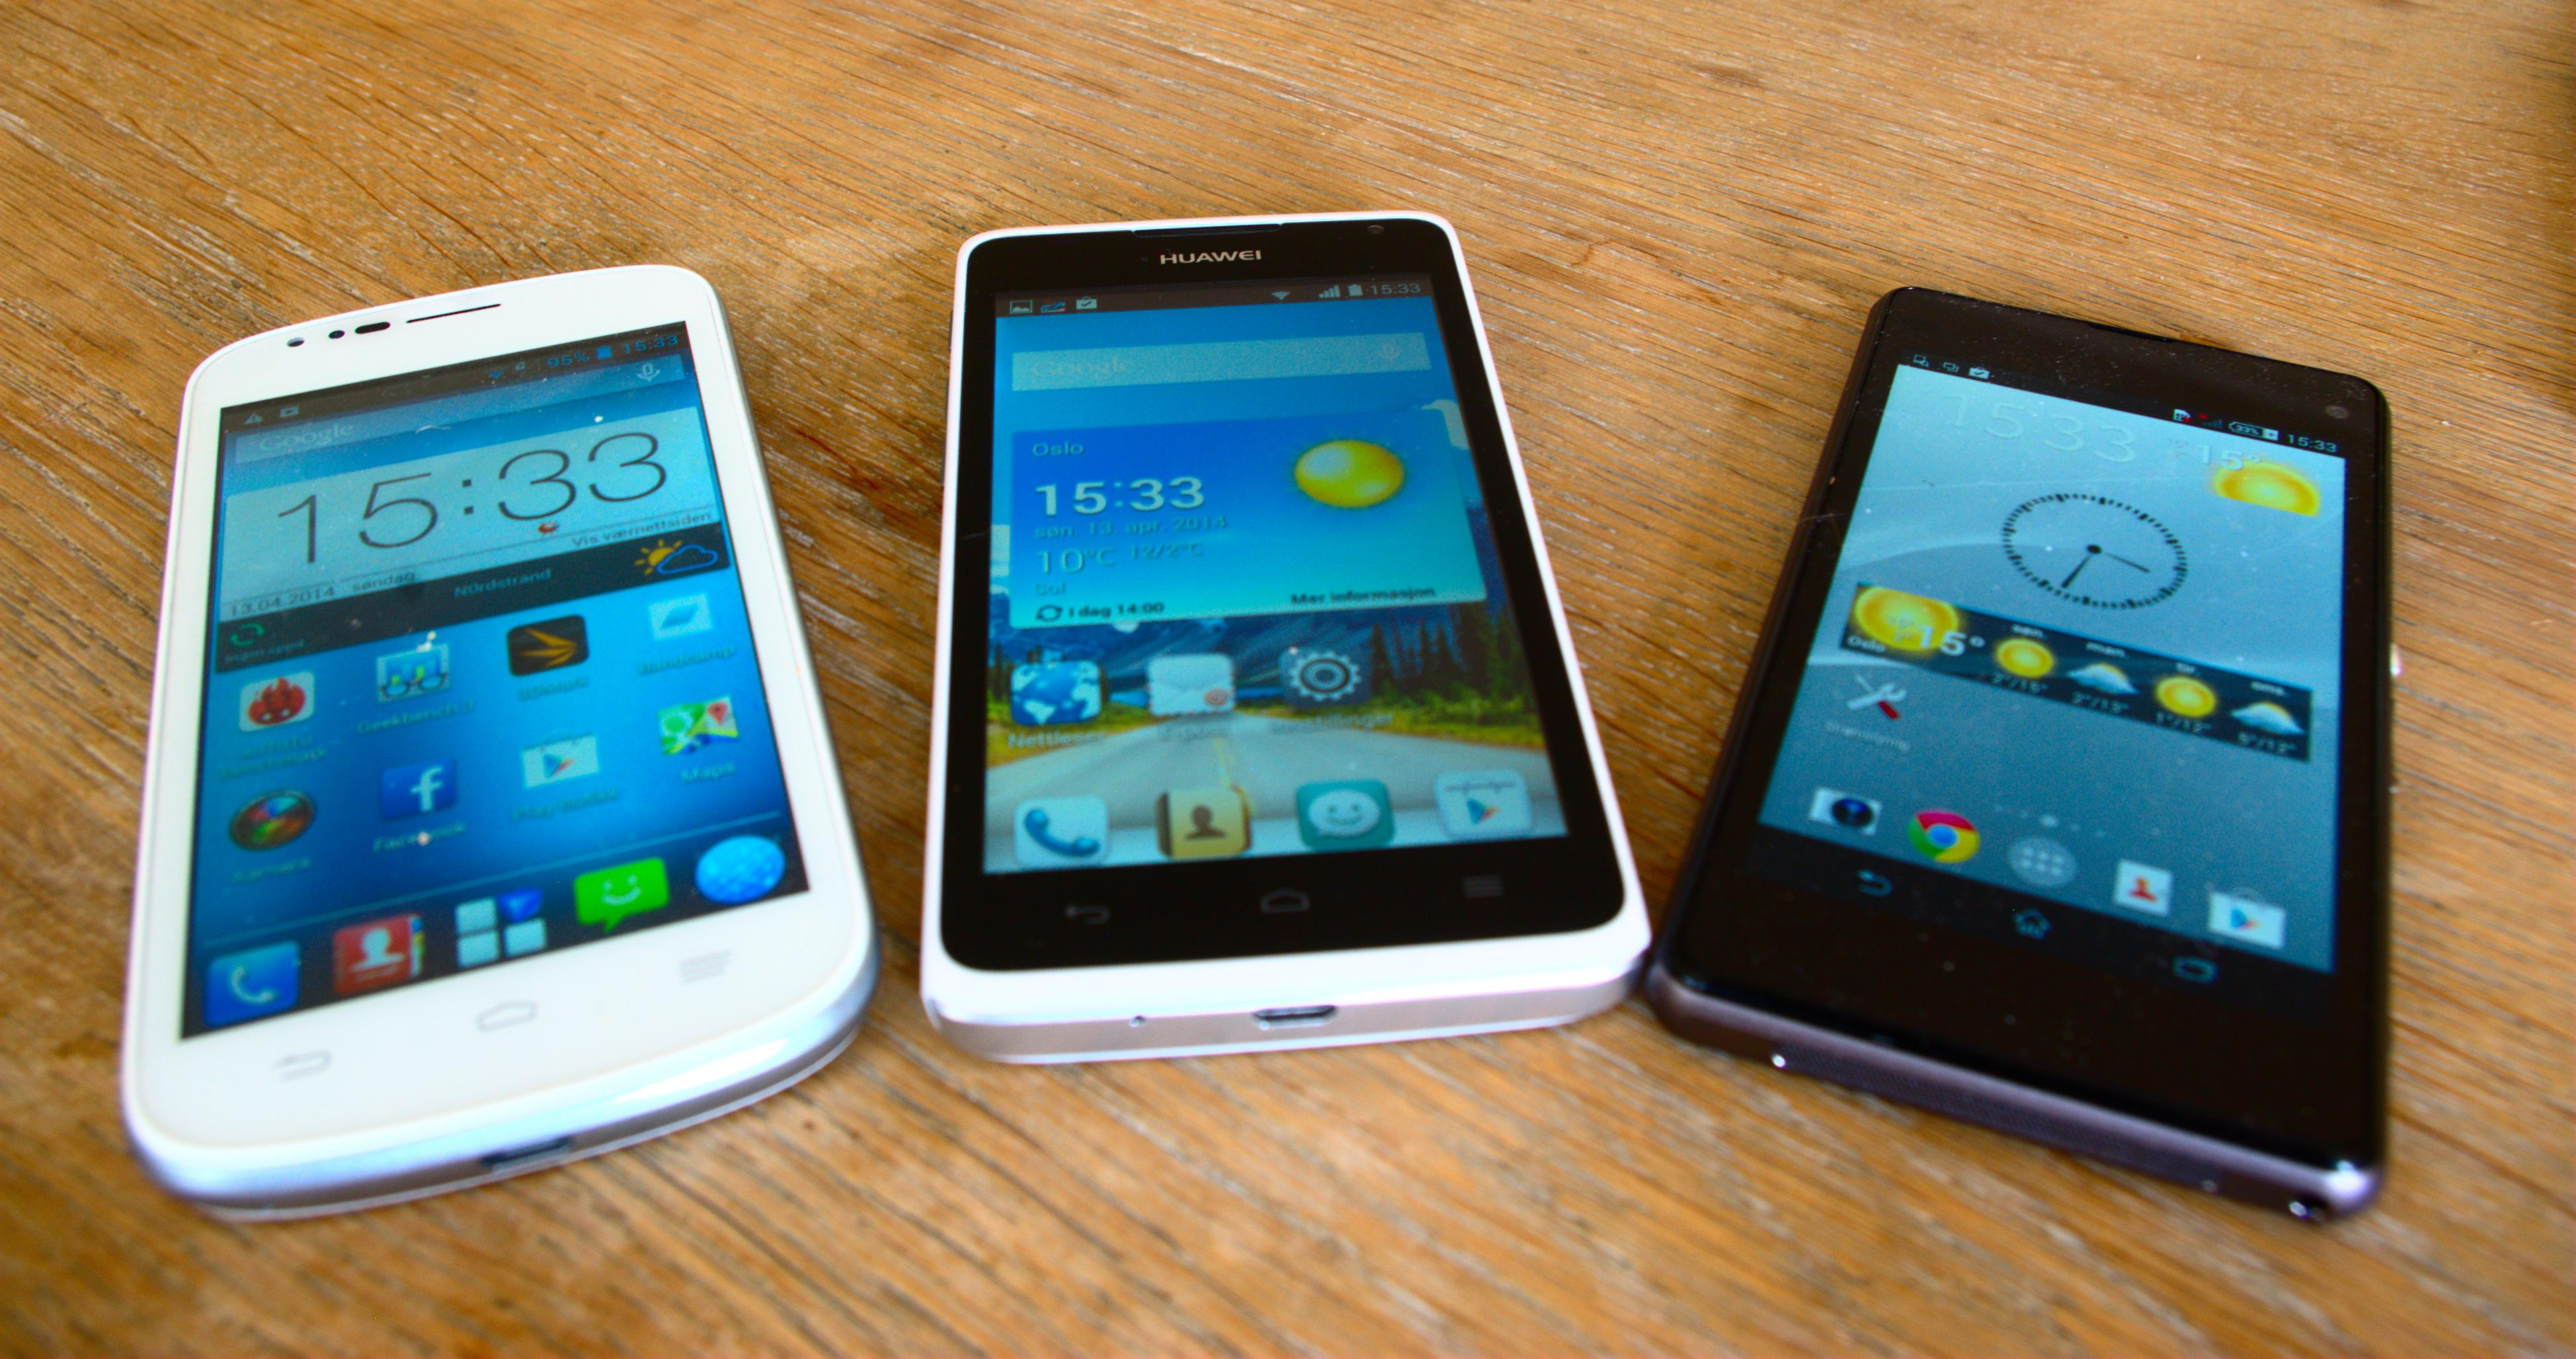 ZTE Blade Q, Huawei Ascend Y530 og Sony Xperia Z1 Compact.Foto: Einar Eriksen